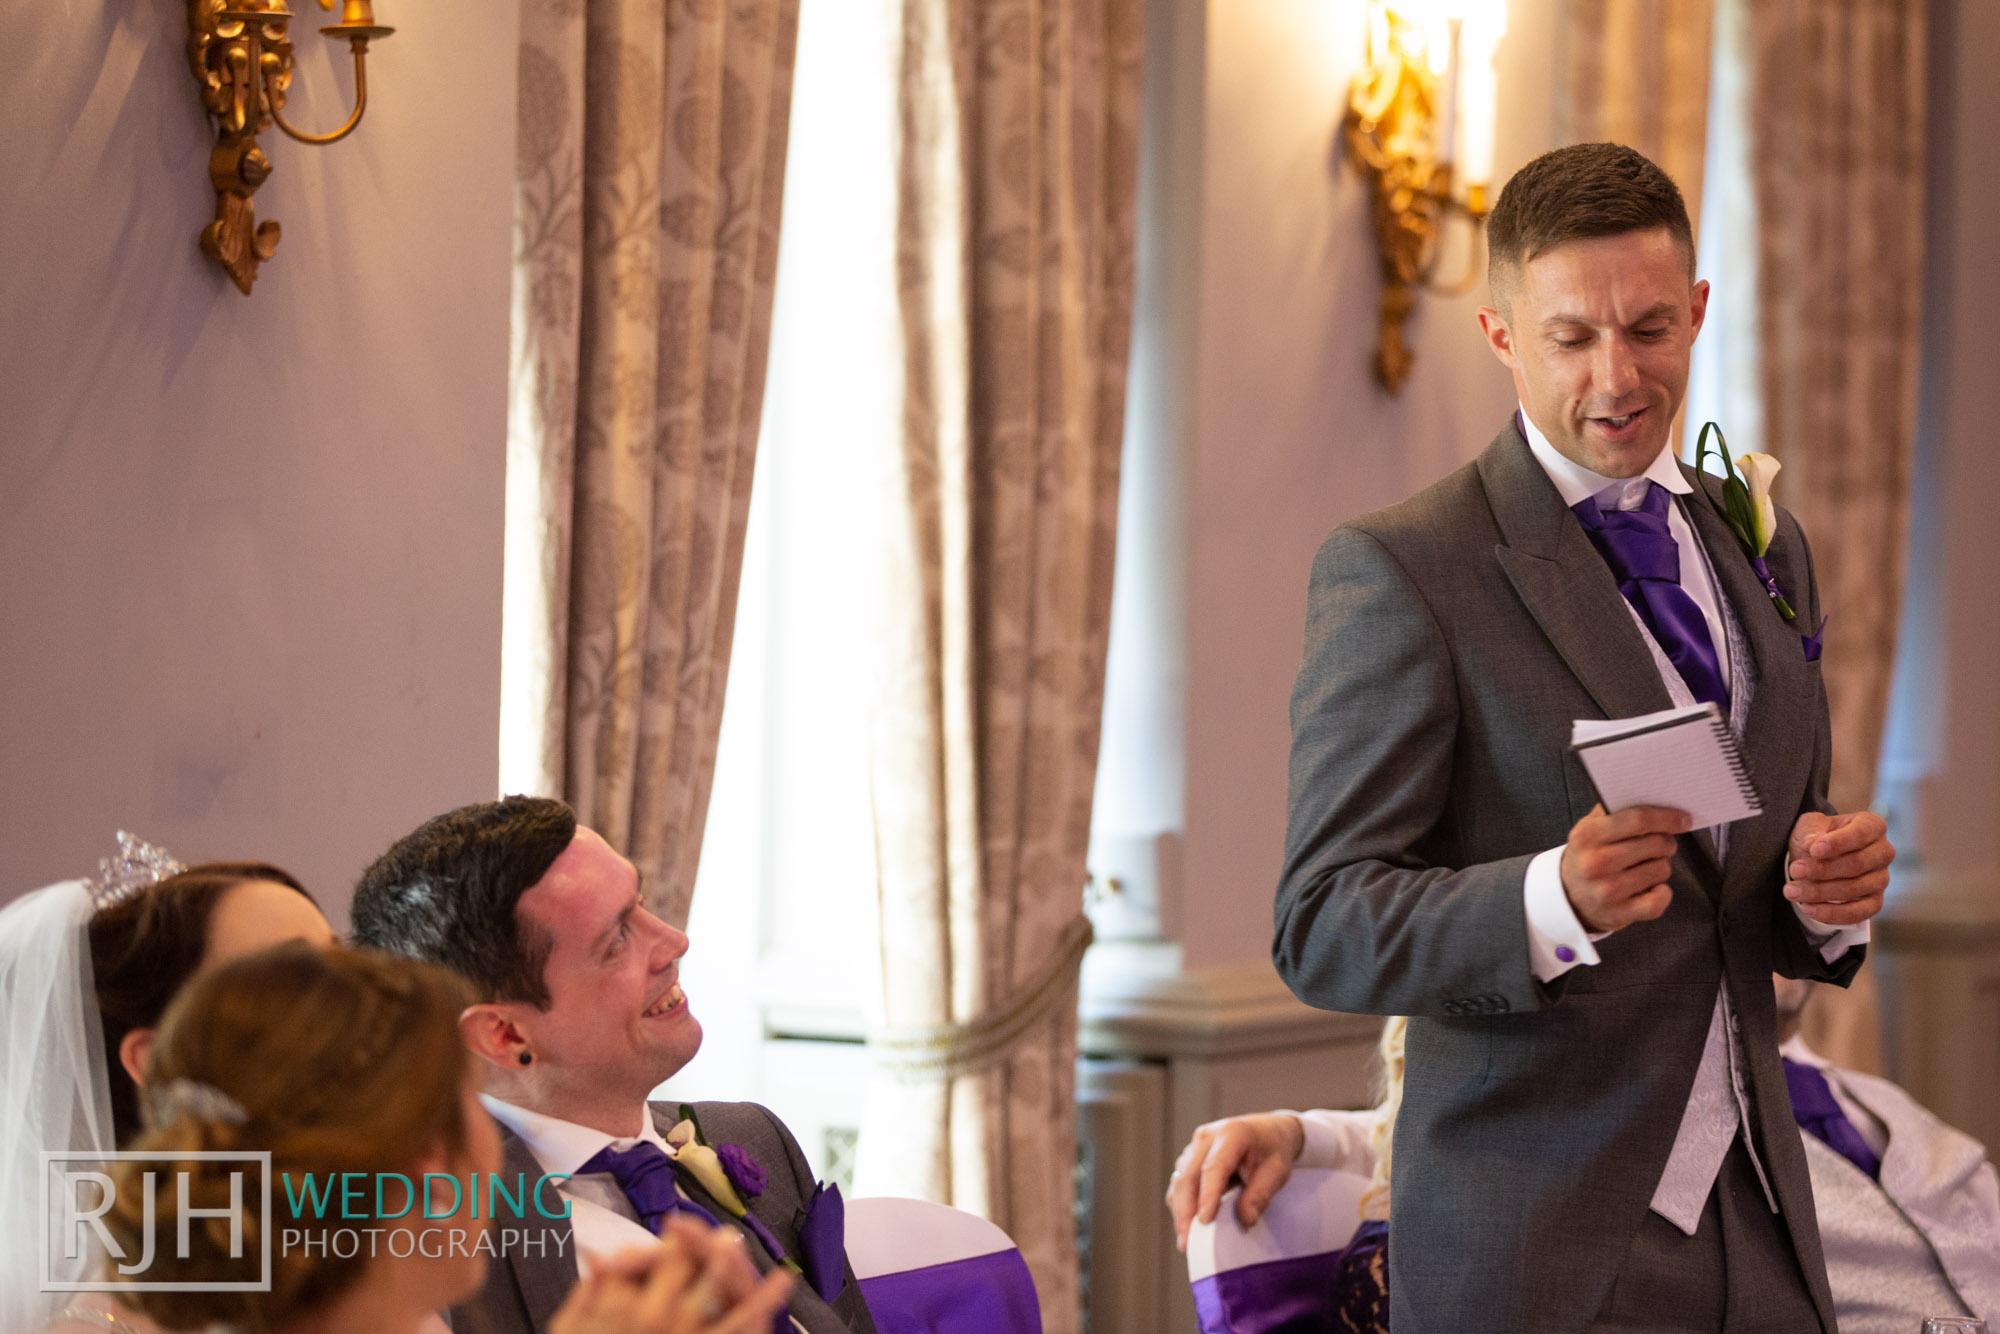 Oulton Hall Wedding Photography_Goodwill-Hall_040_RJH18015.jpg